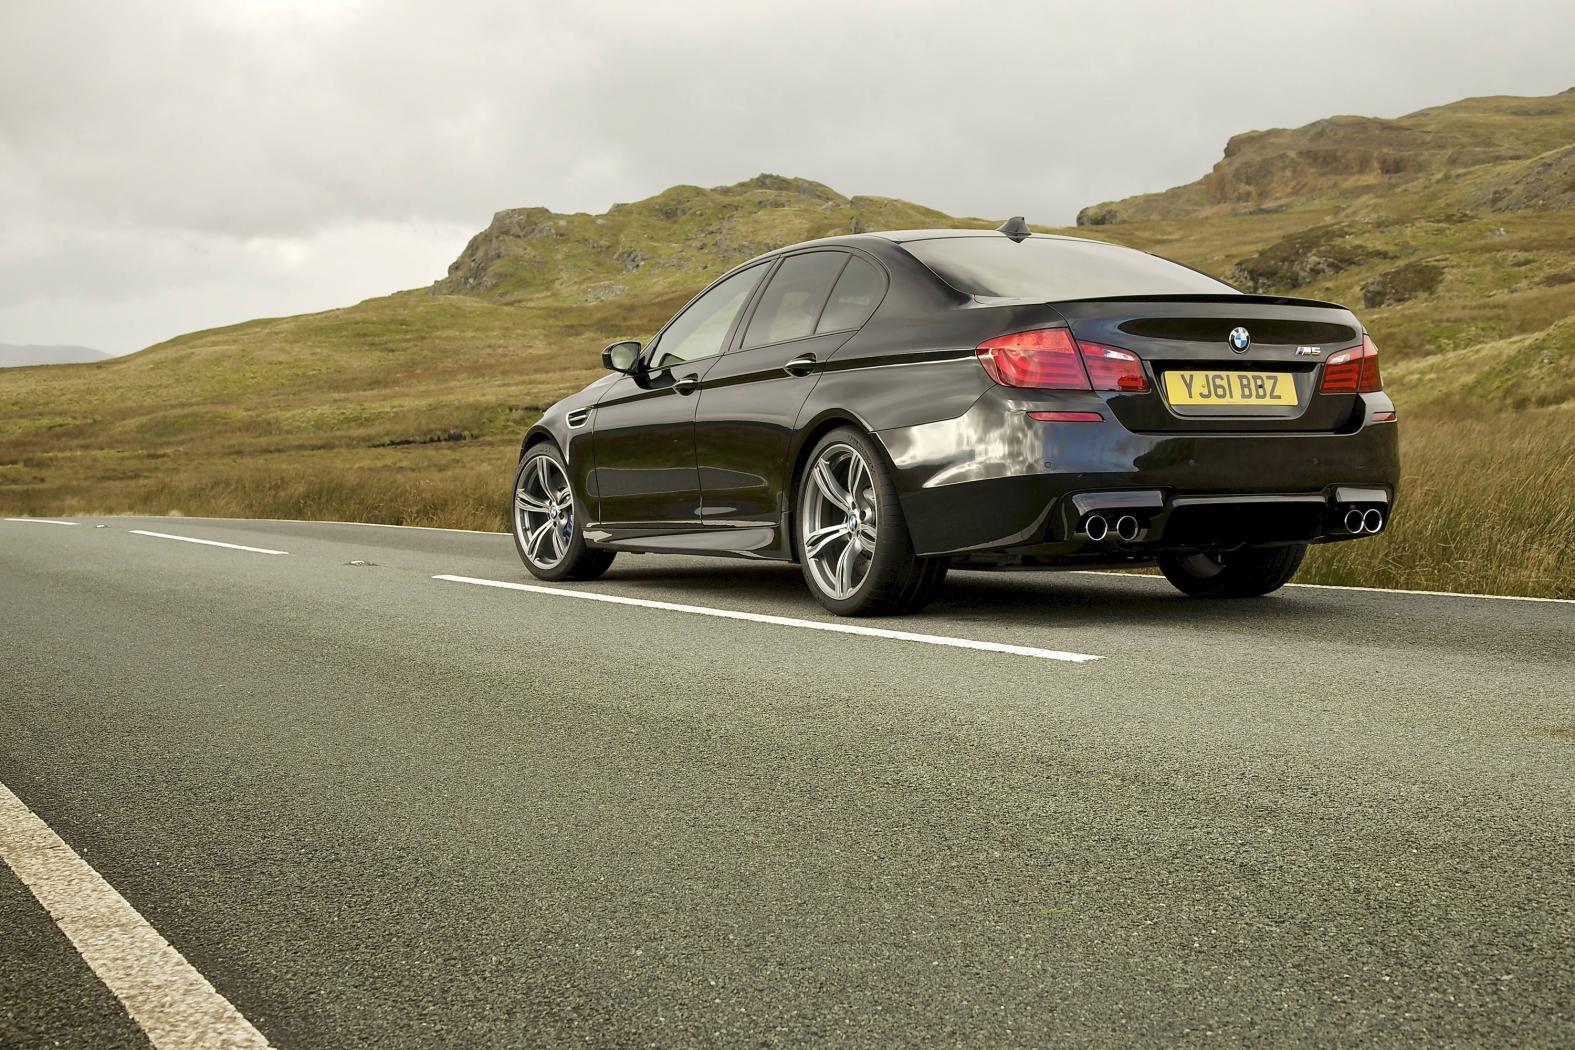 BMW-M5-F10-11.jpeg